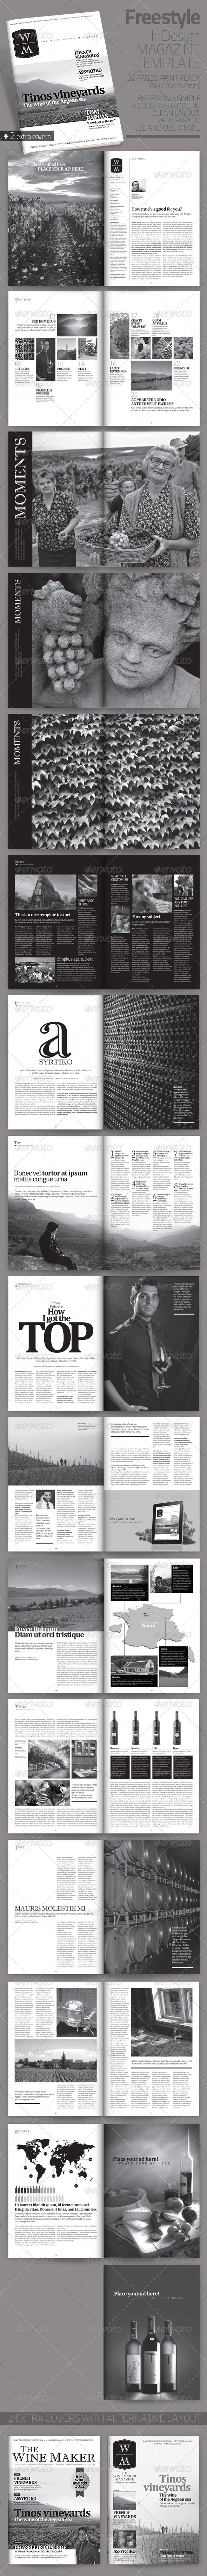 Freestyle | InDesign Magazine Template - Magazines Print Templates